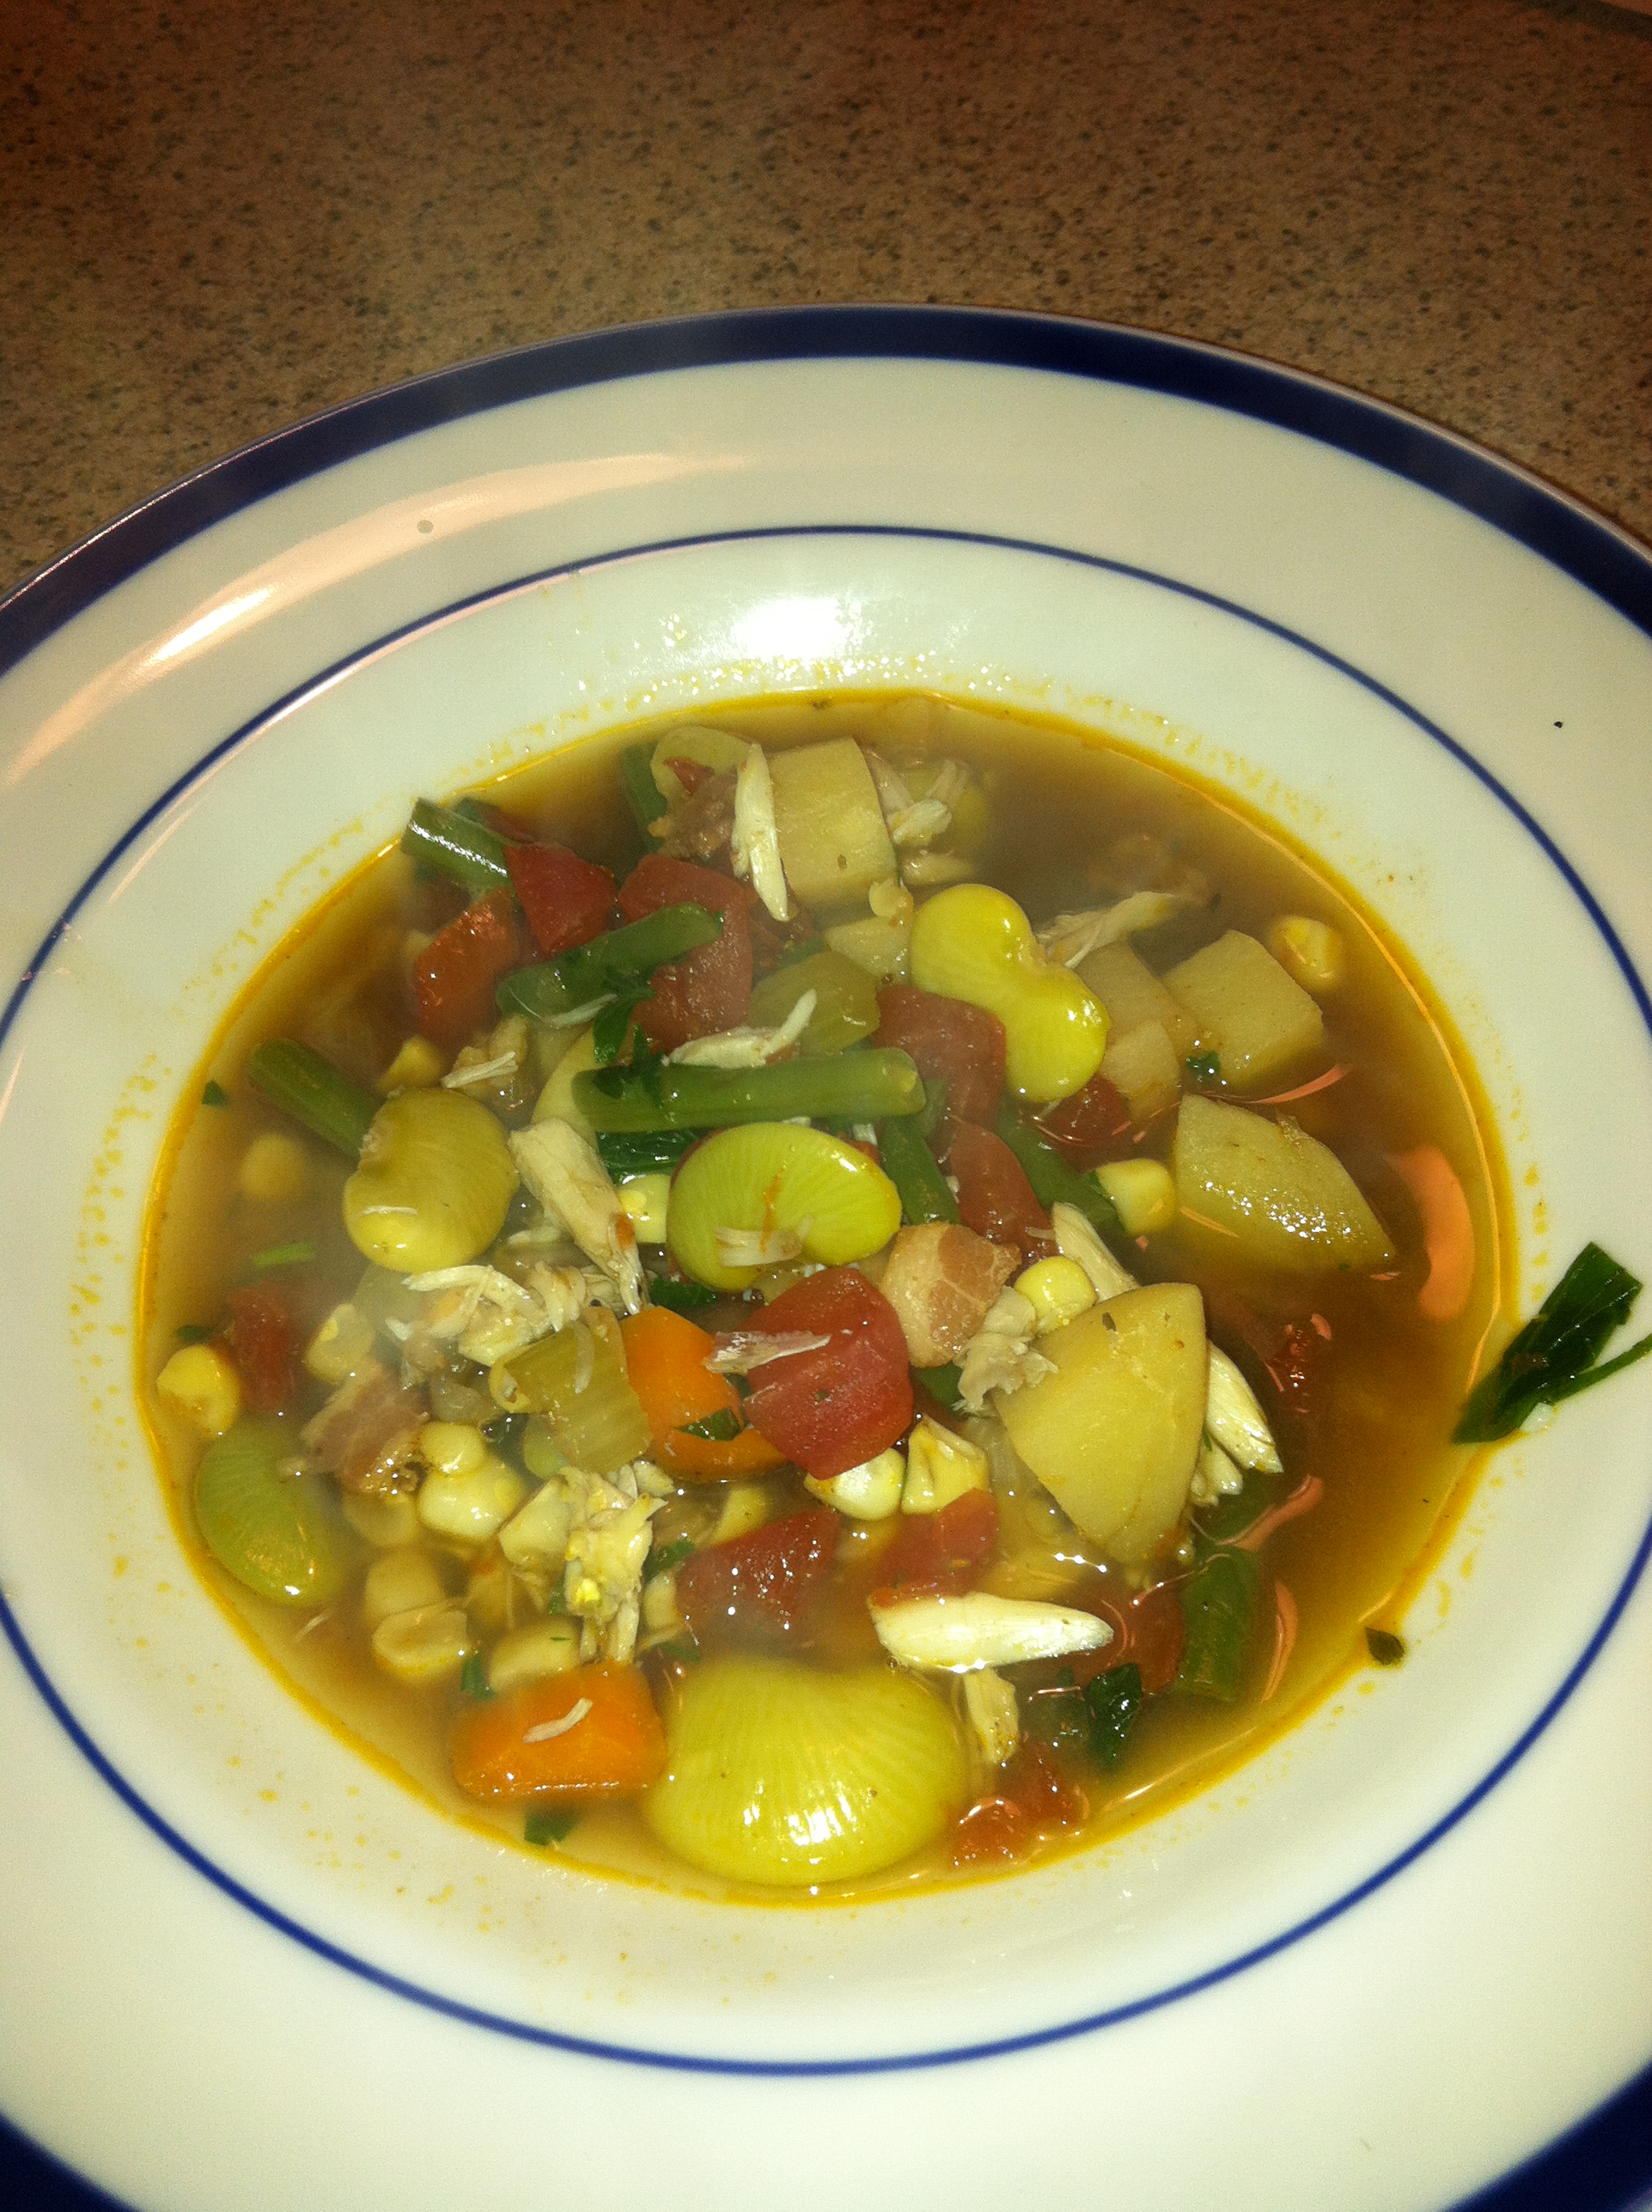 crab_soup.JPG?1380094483